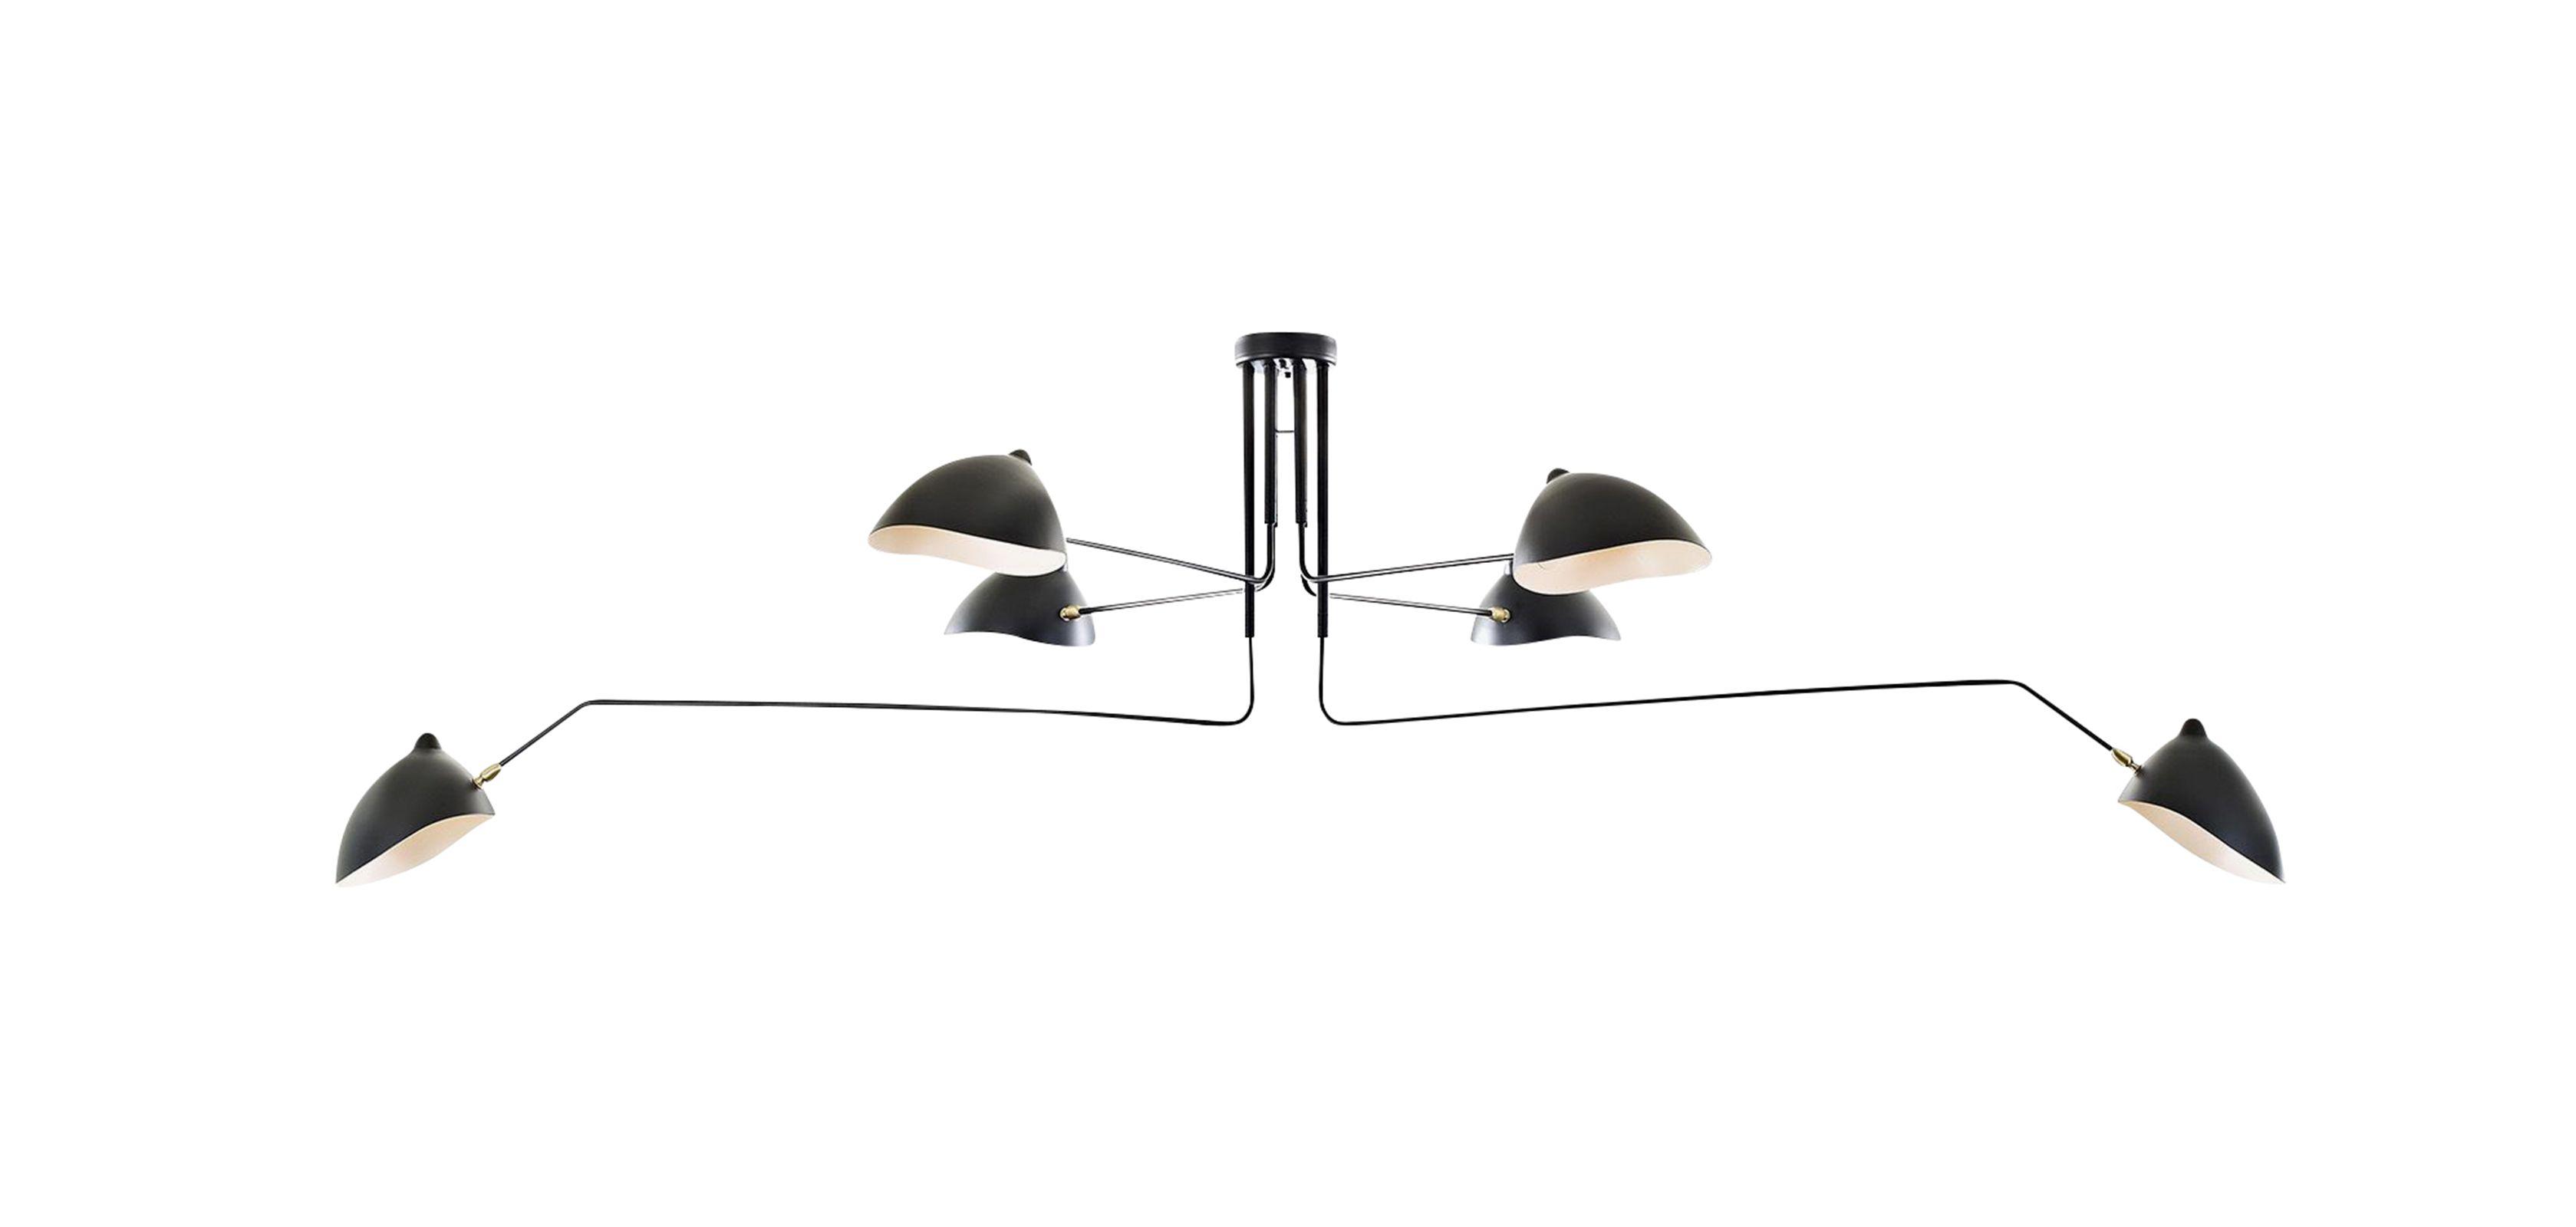 Lampe en suspension mcl r6 serge mouille style living rooms lampe en suspension mcl r6 serge mouille style arubaitofo Choice Image